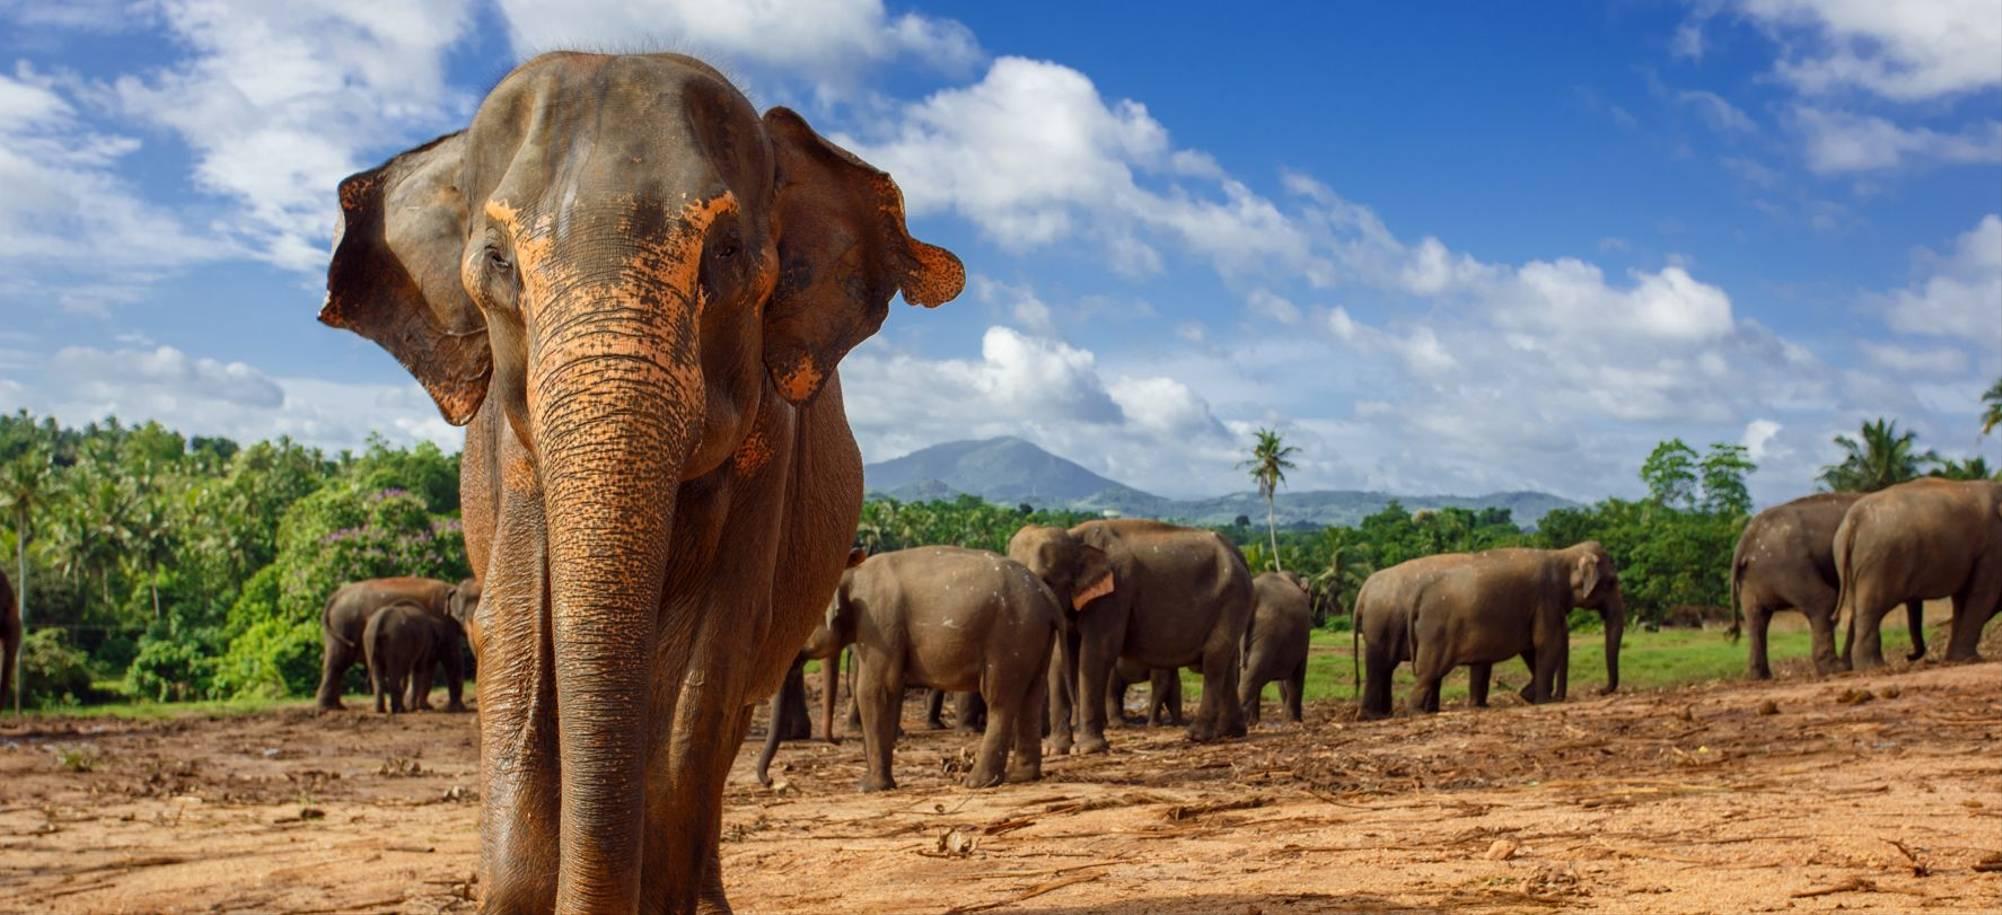 Colombo2 - Pinnawala Elephant Orphanage - Itinerary Desktop .jpg